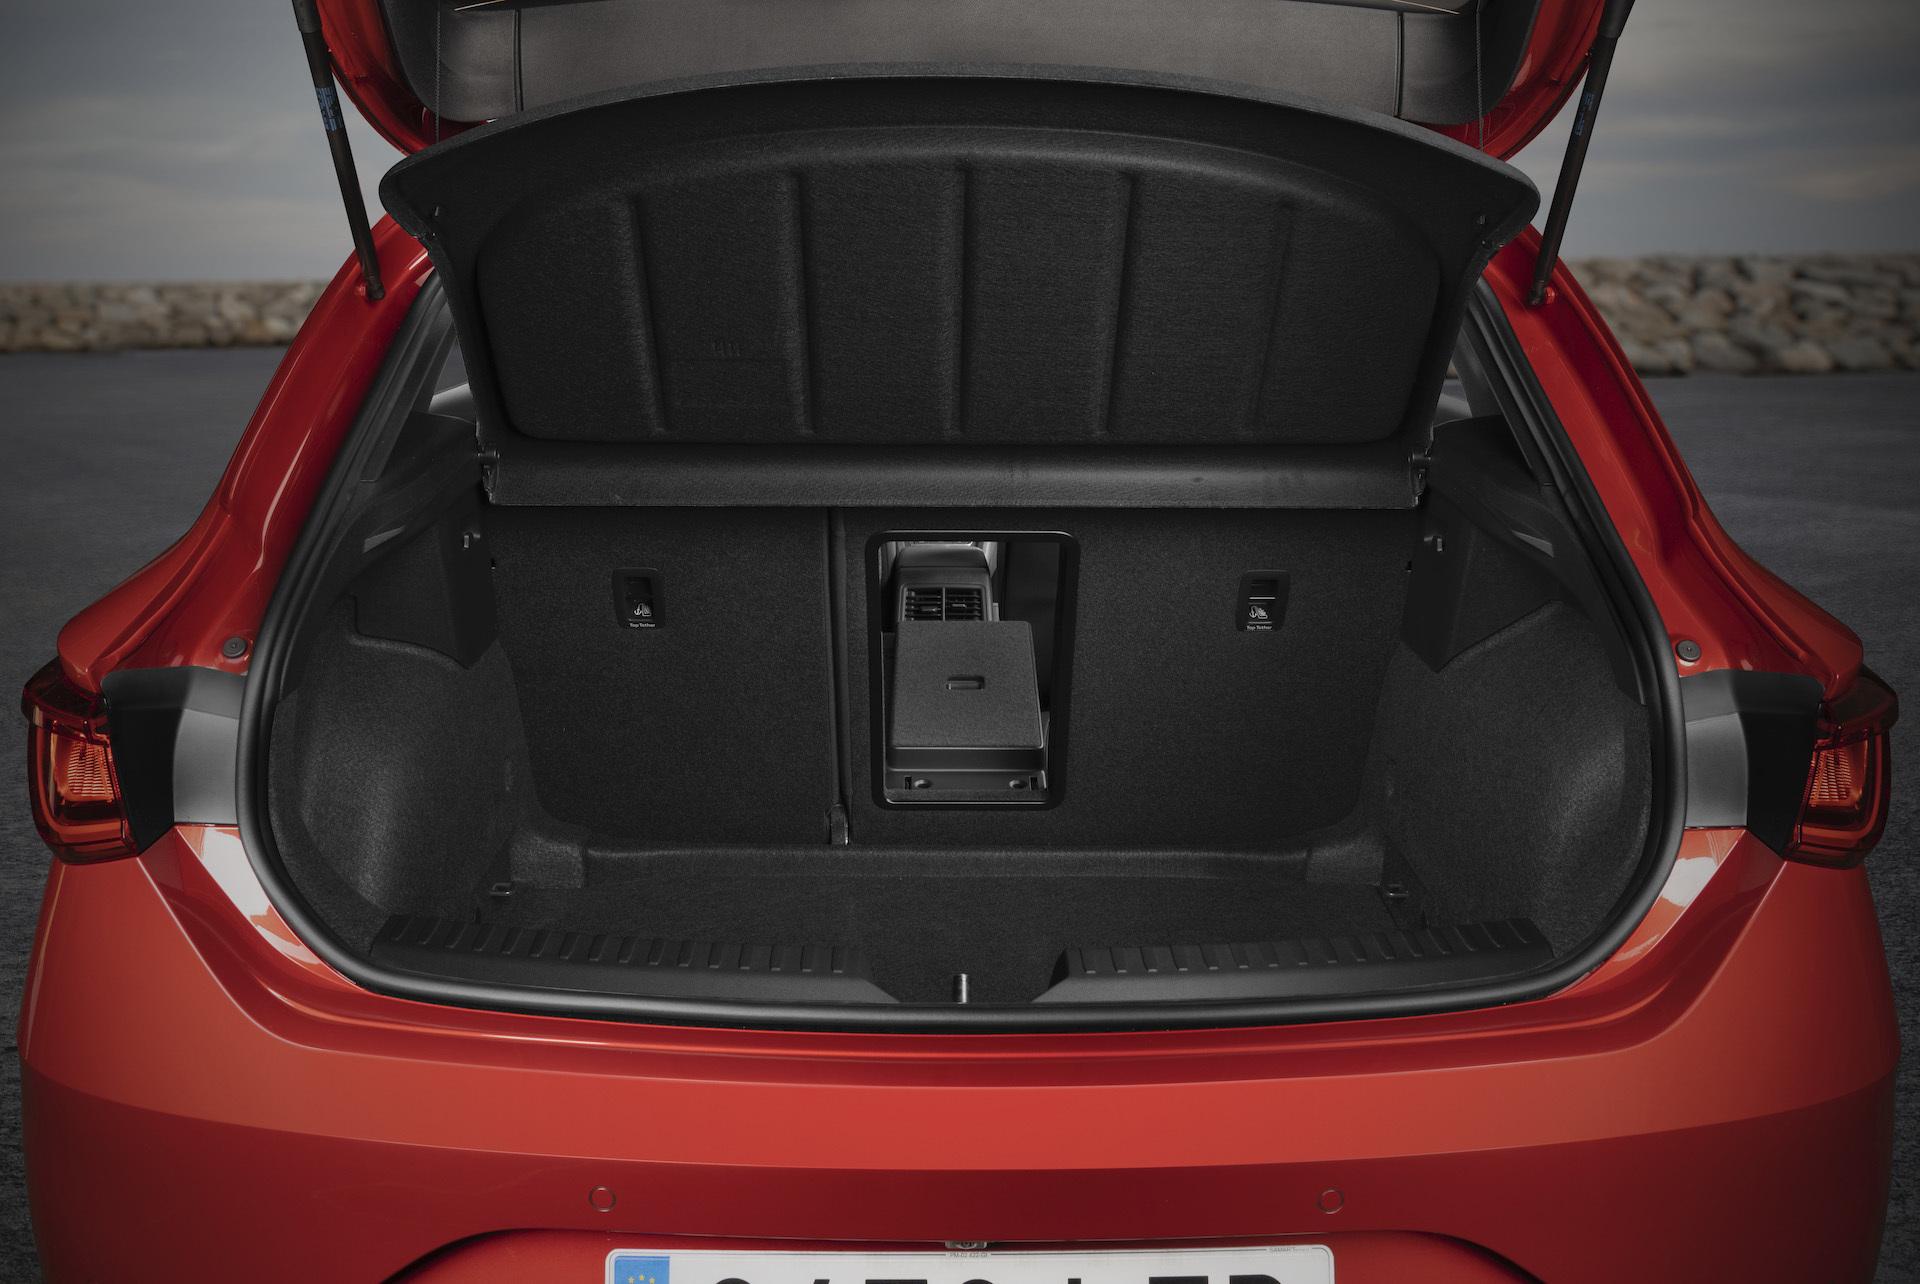 SEAT Leon mk4 (2020) 65